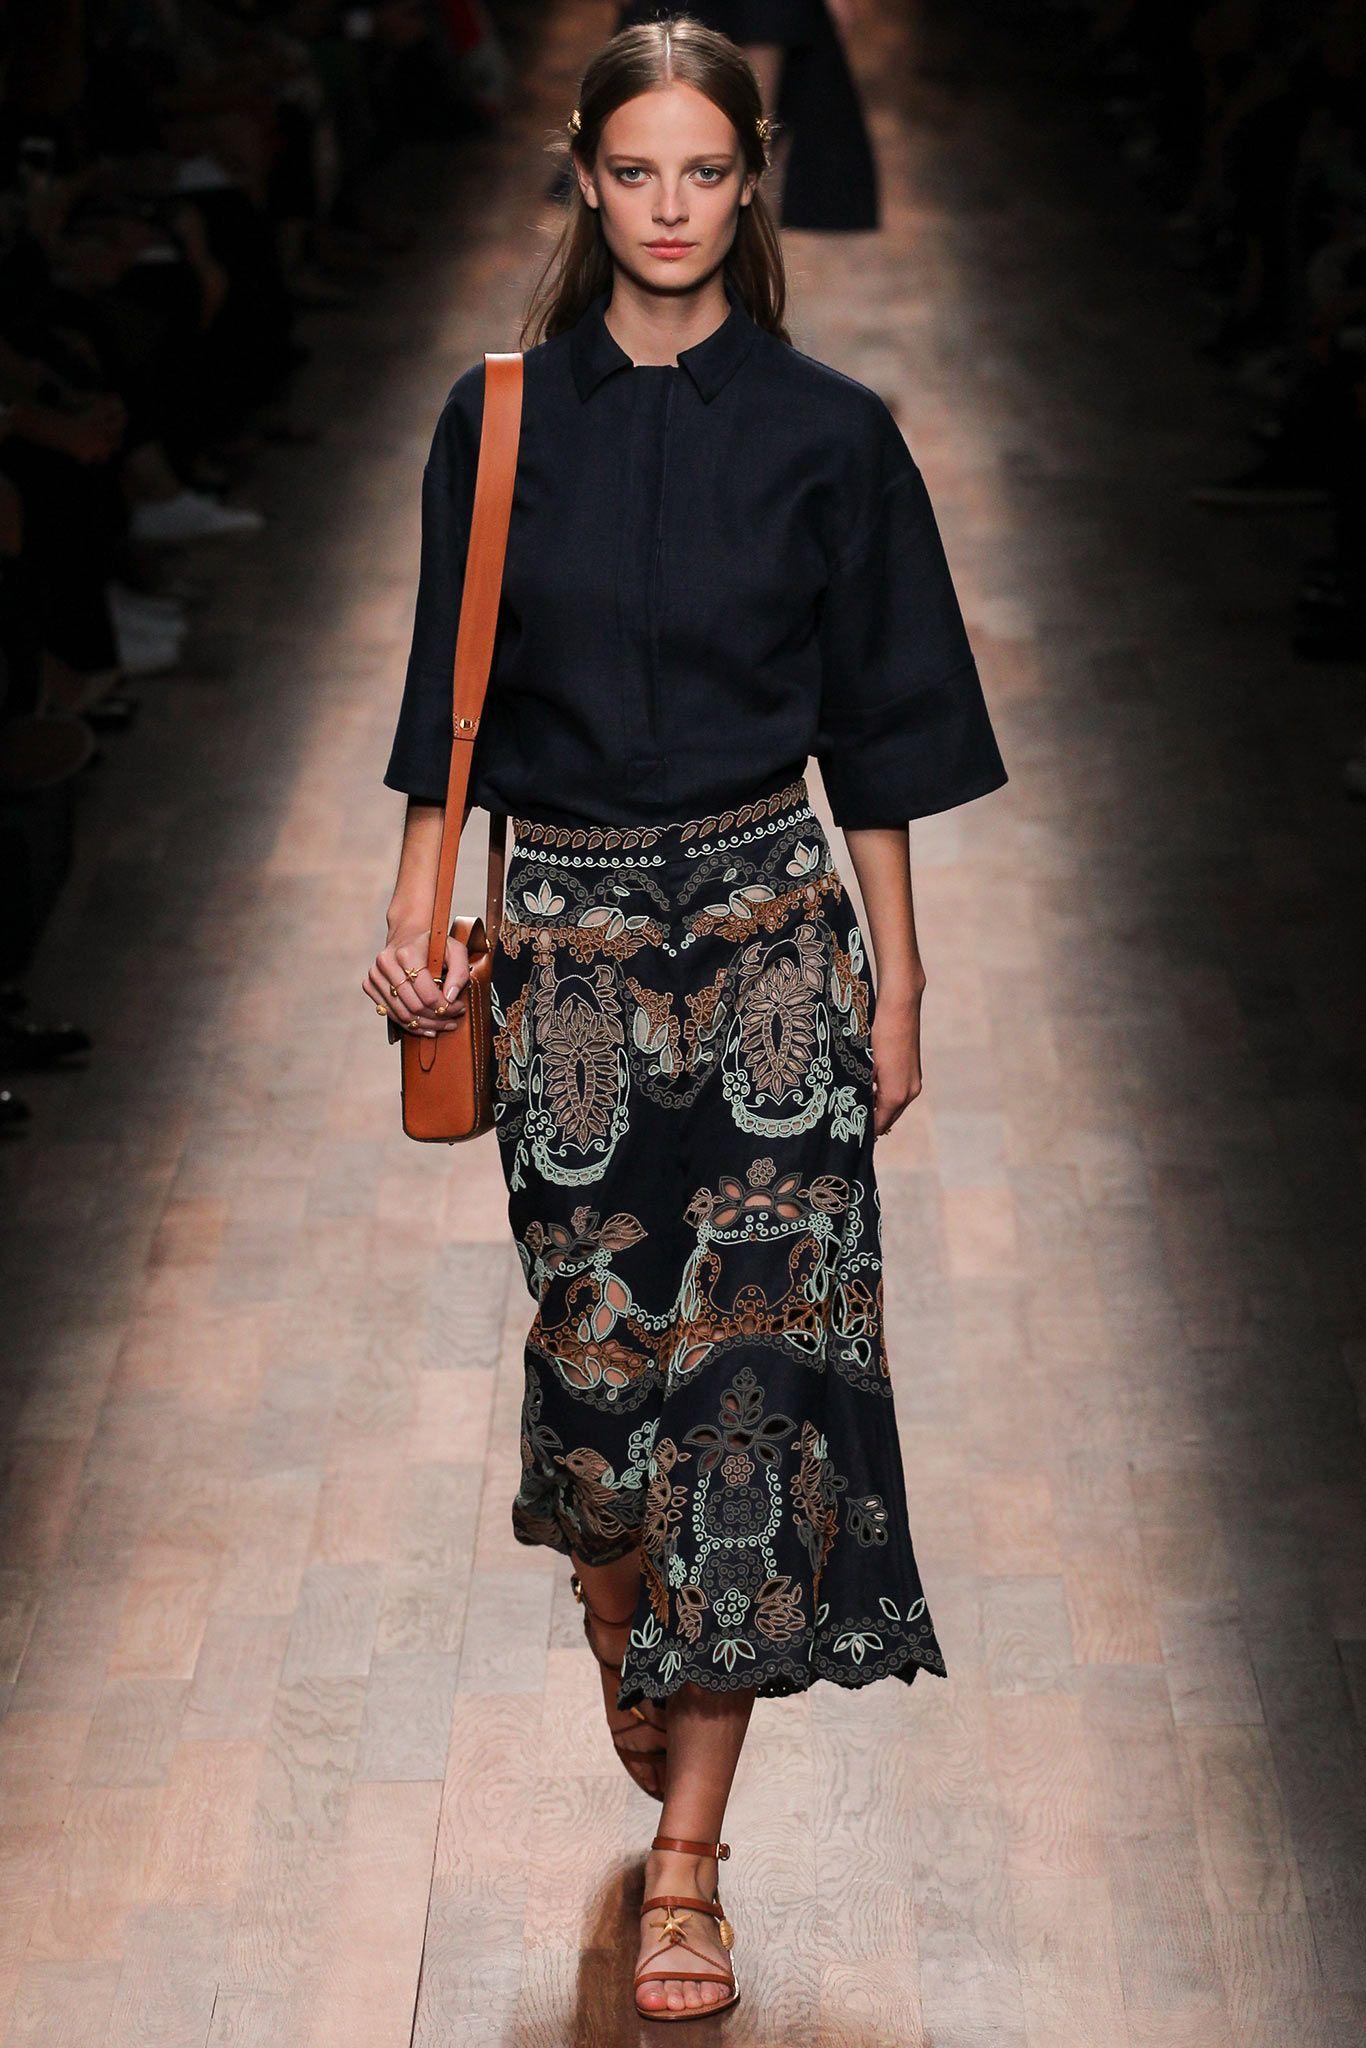 Valentino Garavani spring 2015 ready to wear collection. See more: #ValentinoGaravaniAtFip, #FashionInPics